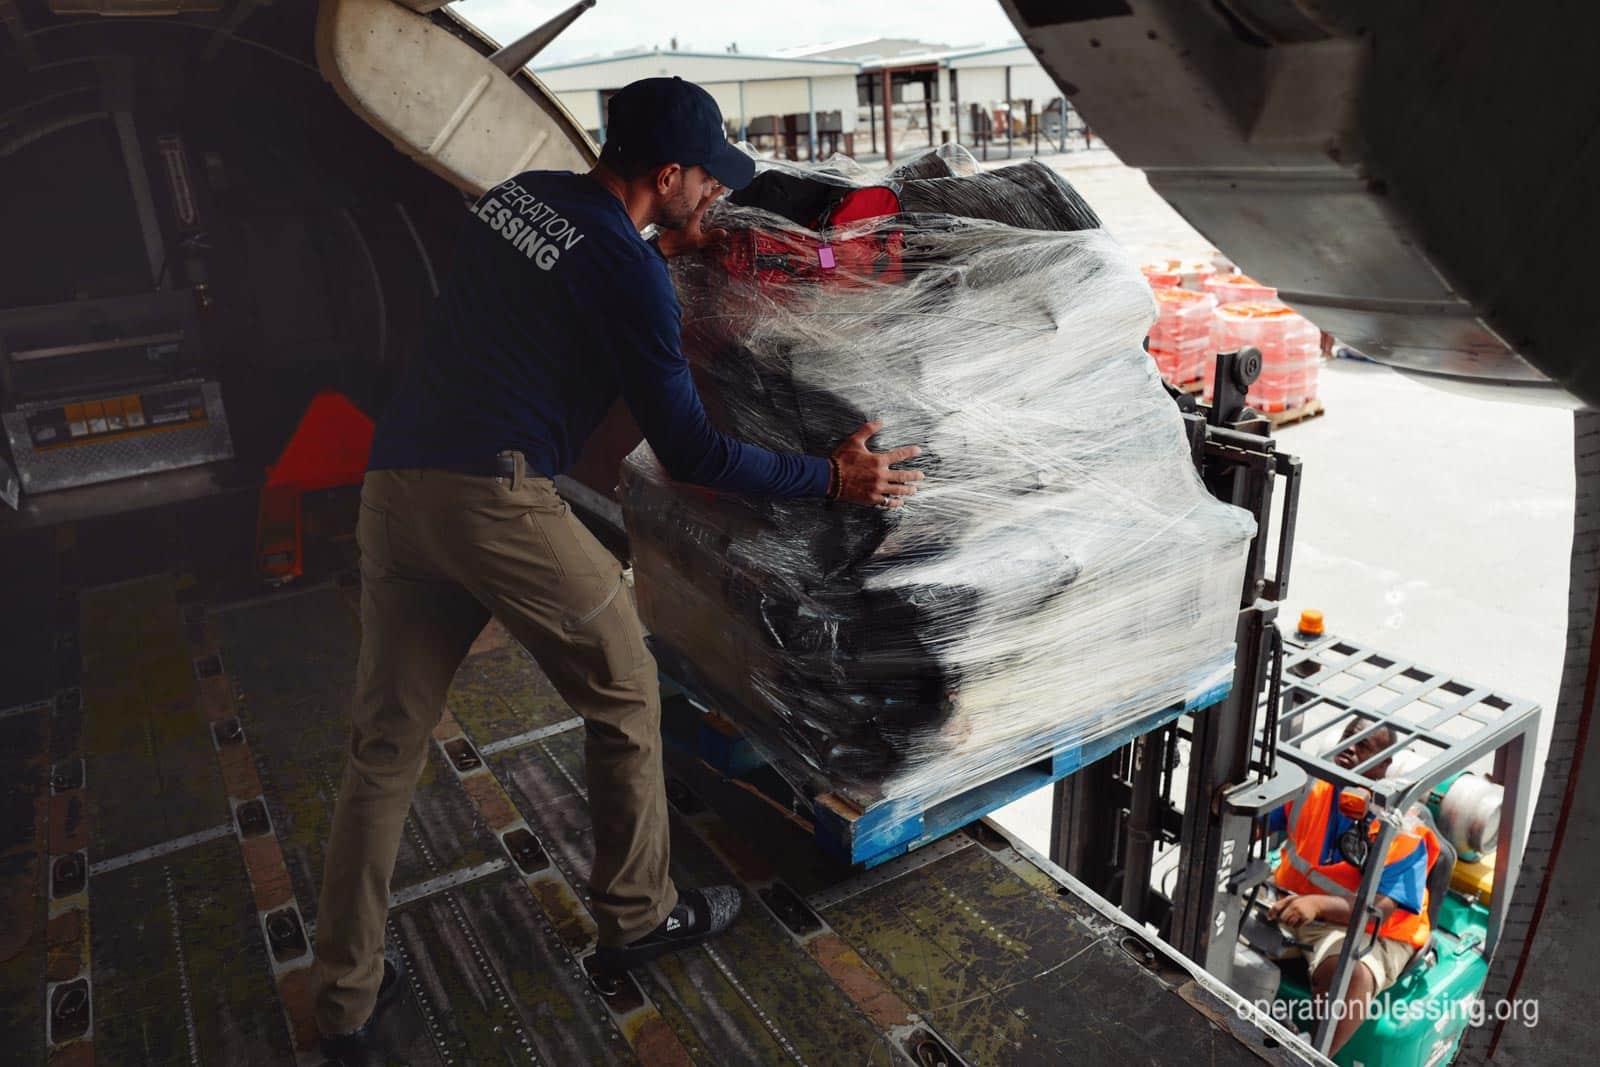 Plane unloading humanitarian supplies in the Bahamas.